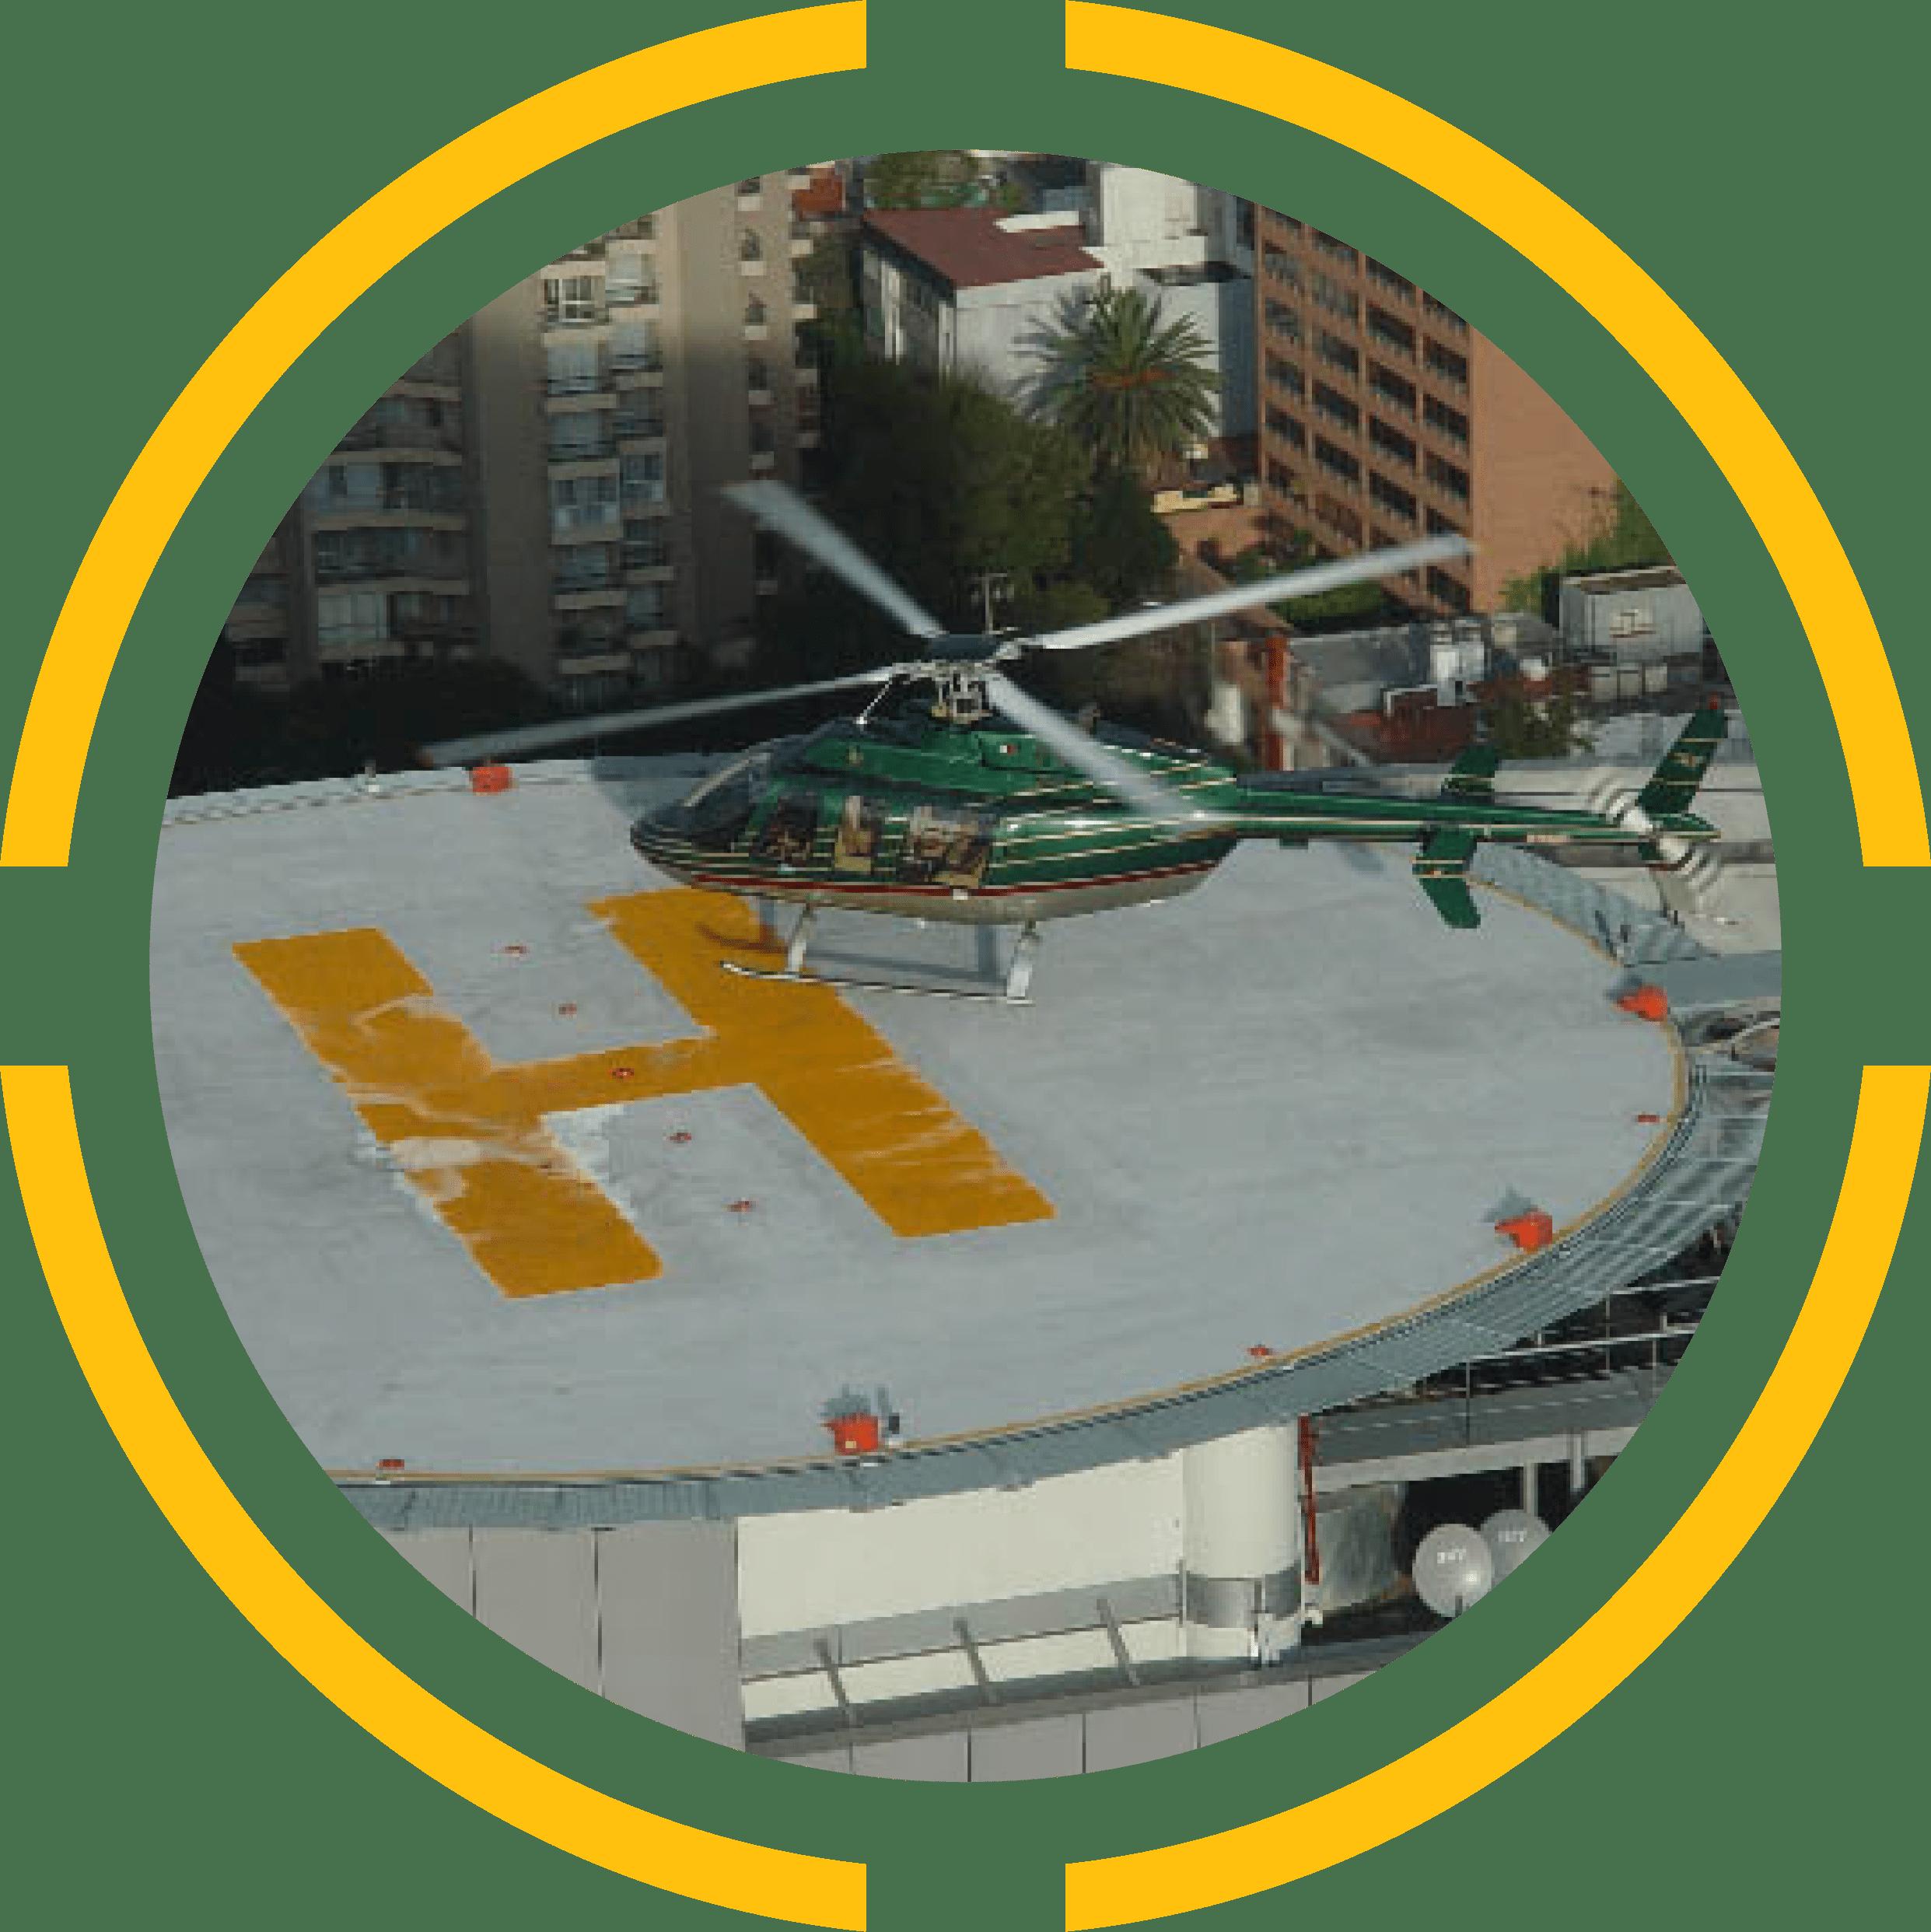 Heliport pad image